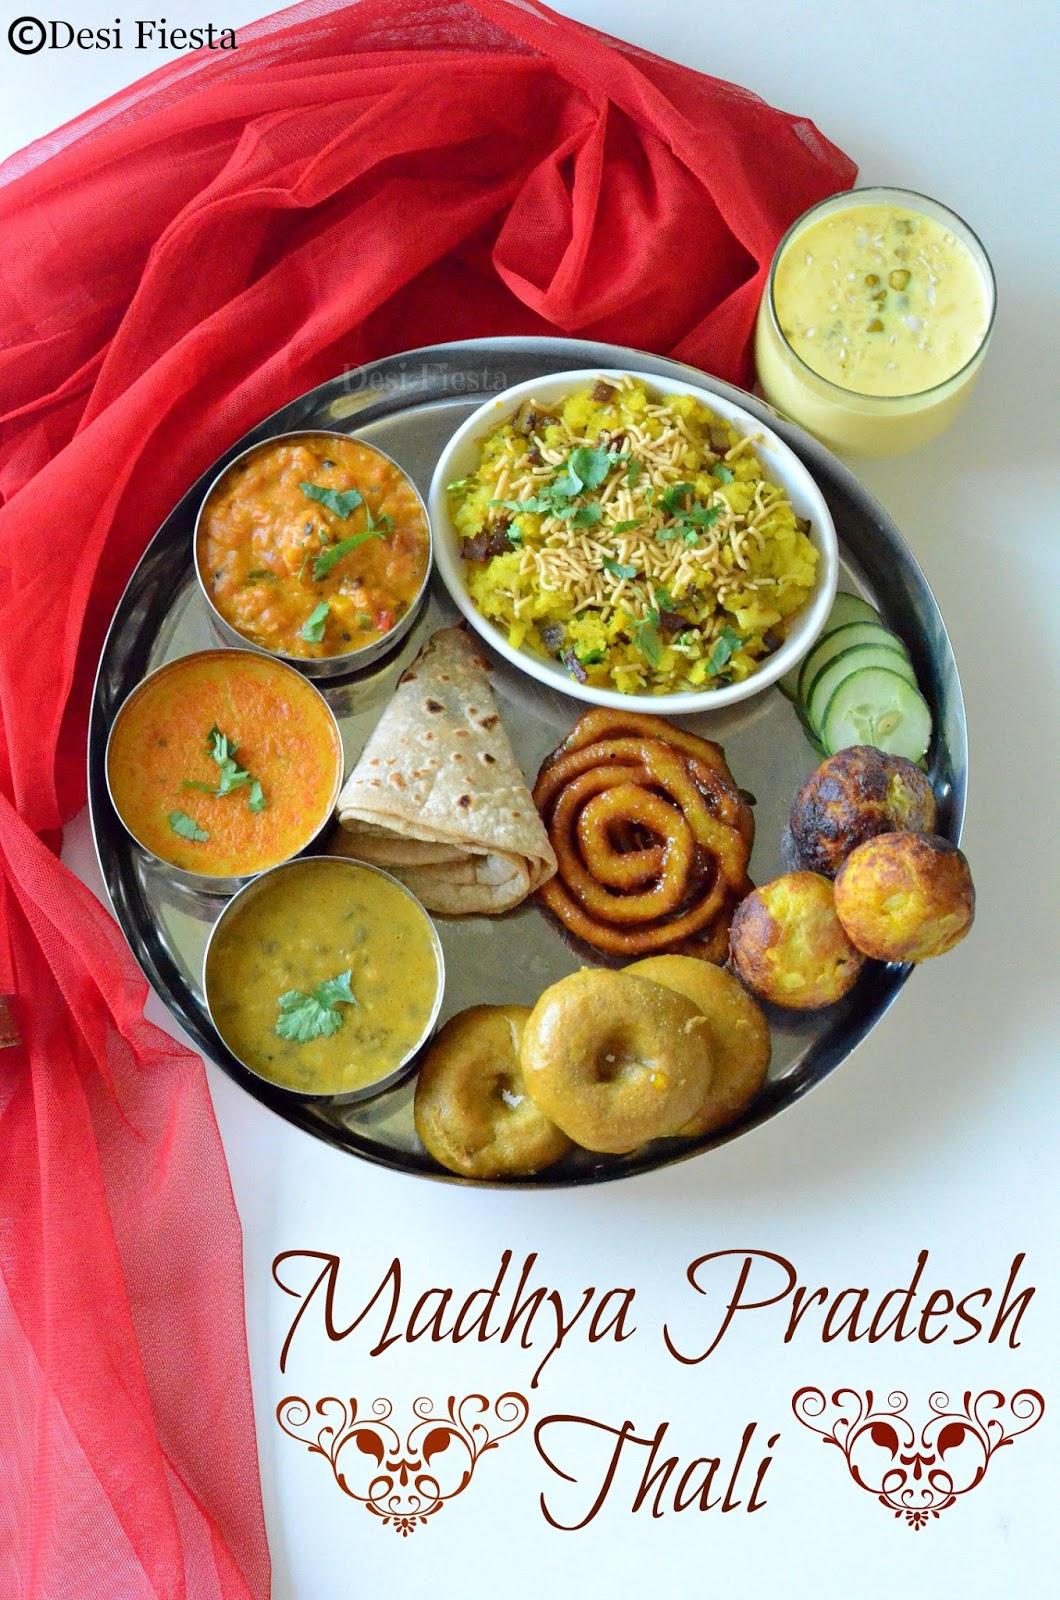 Madhya Pradesh Cuisine of Madhya Pradesh, Popular Food of Madhya Pradesh